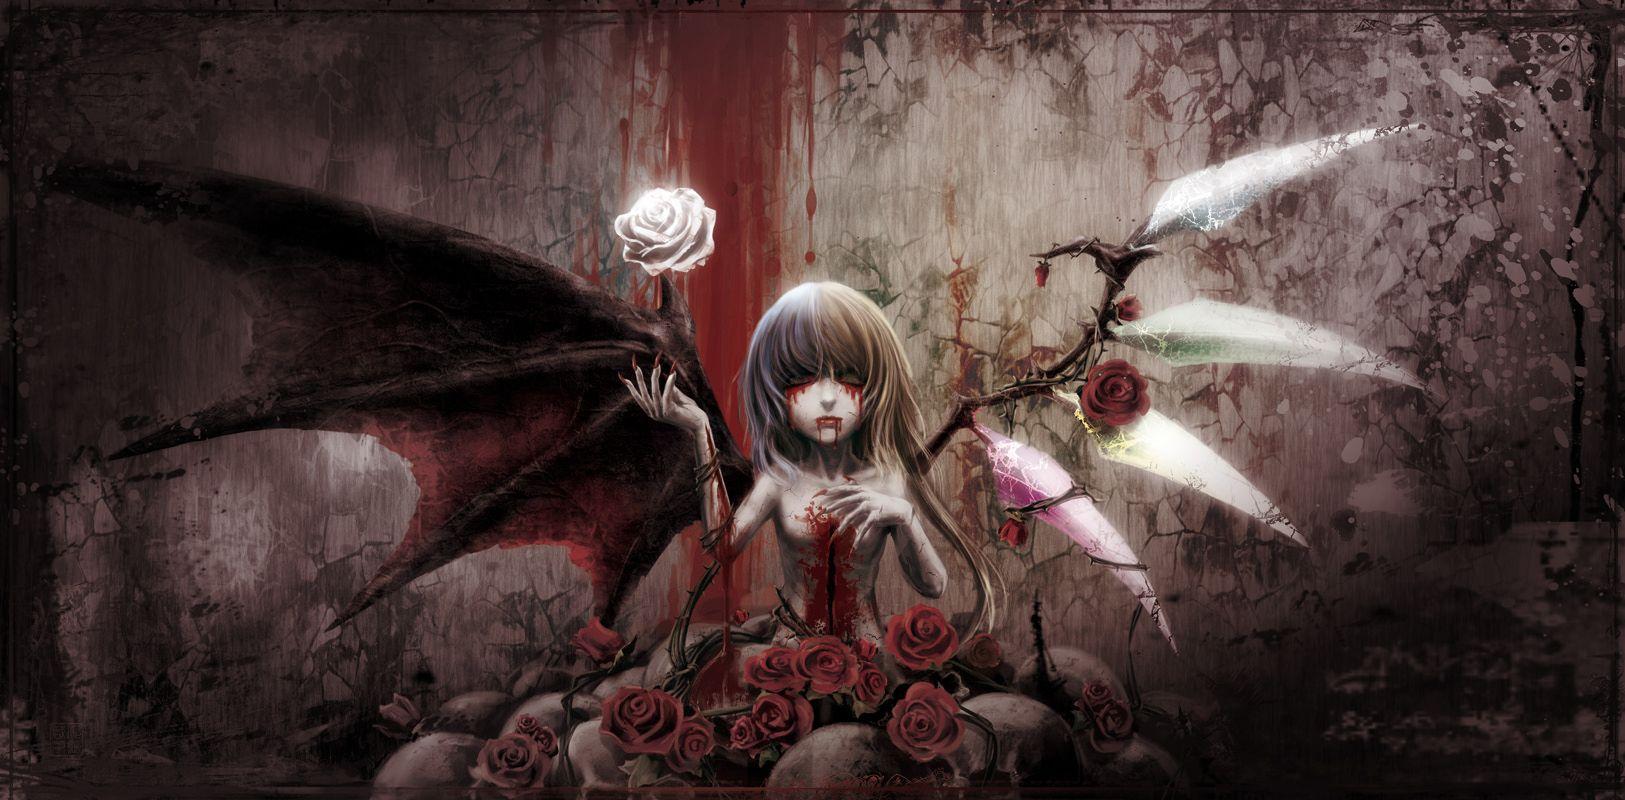 Anime Touhou Flandre Scarlet Vampire Wallpaper Anime Art Fantasy Anime Art Dark Anime Art Beautiful